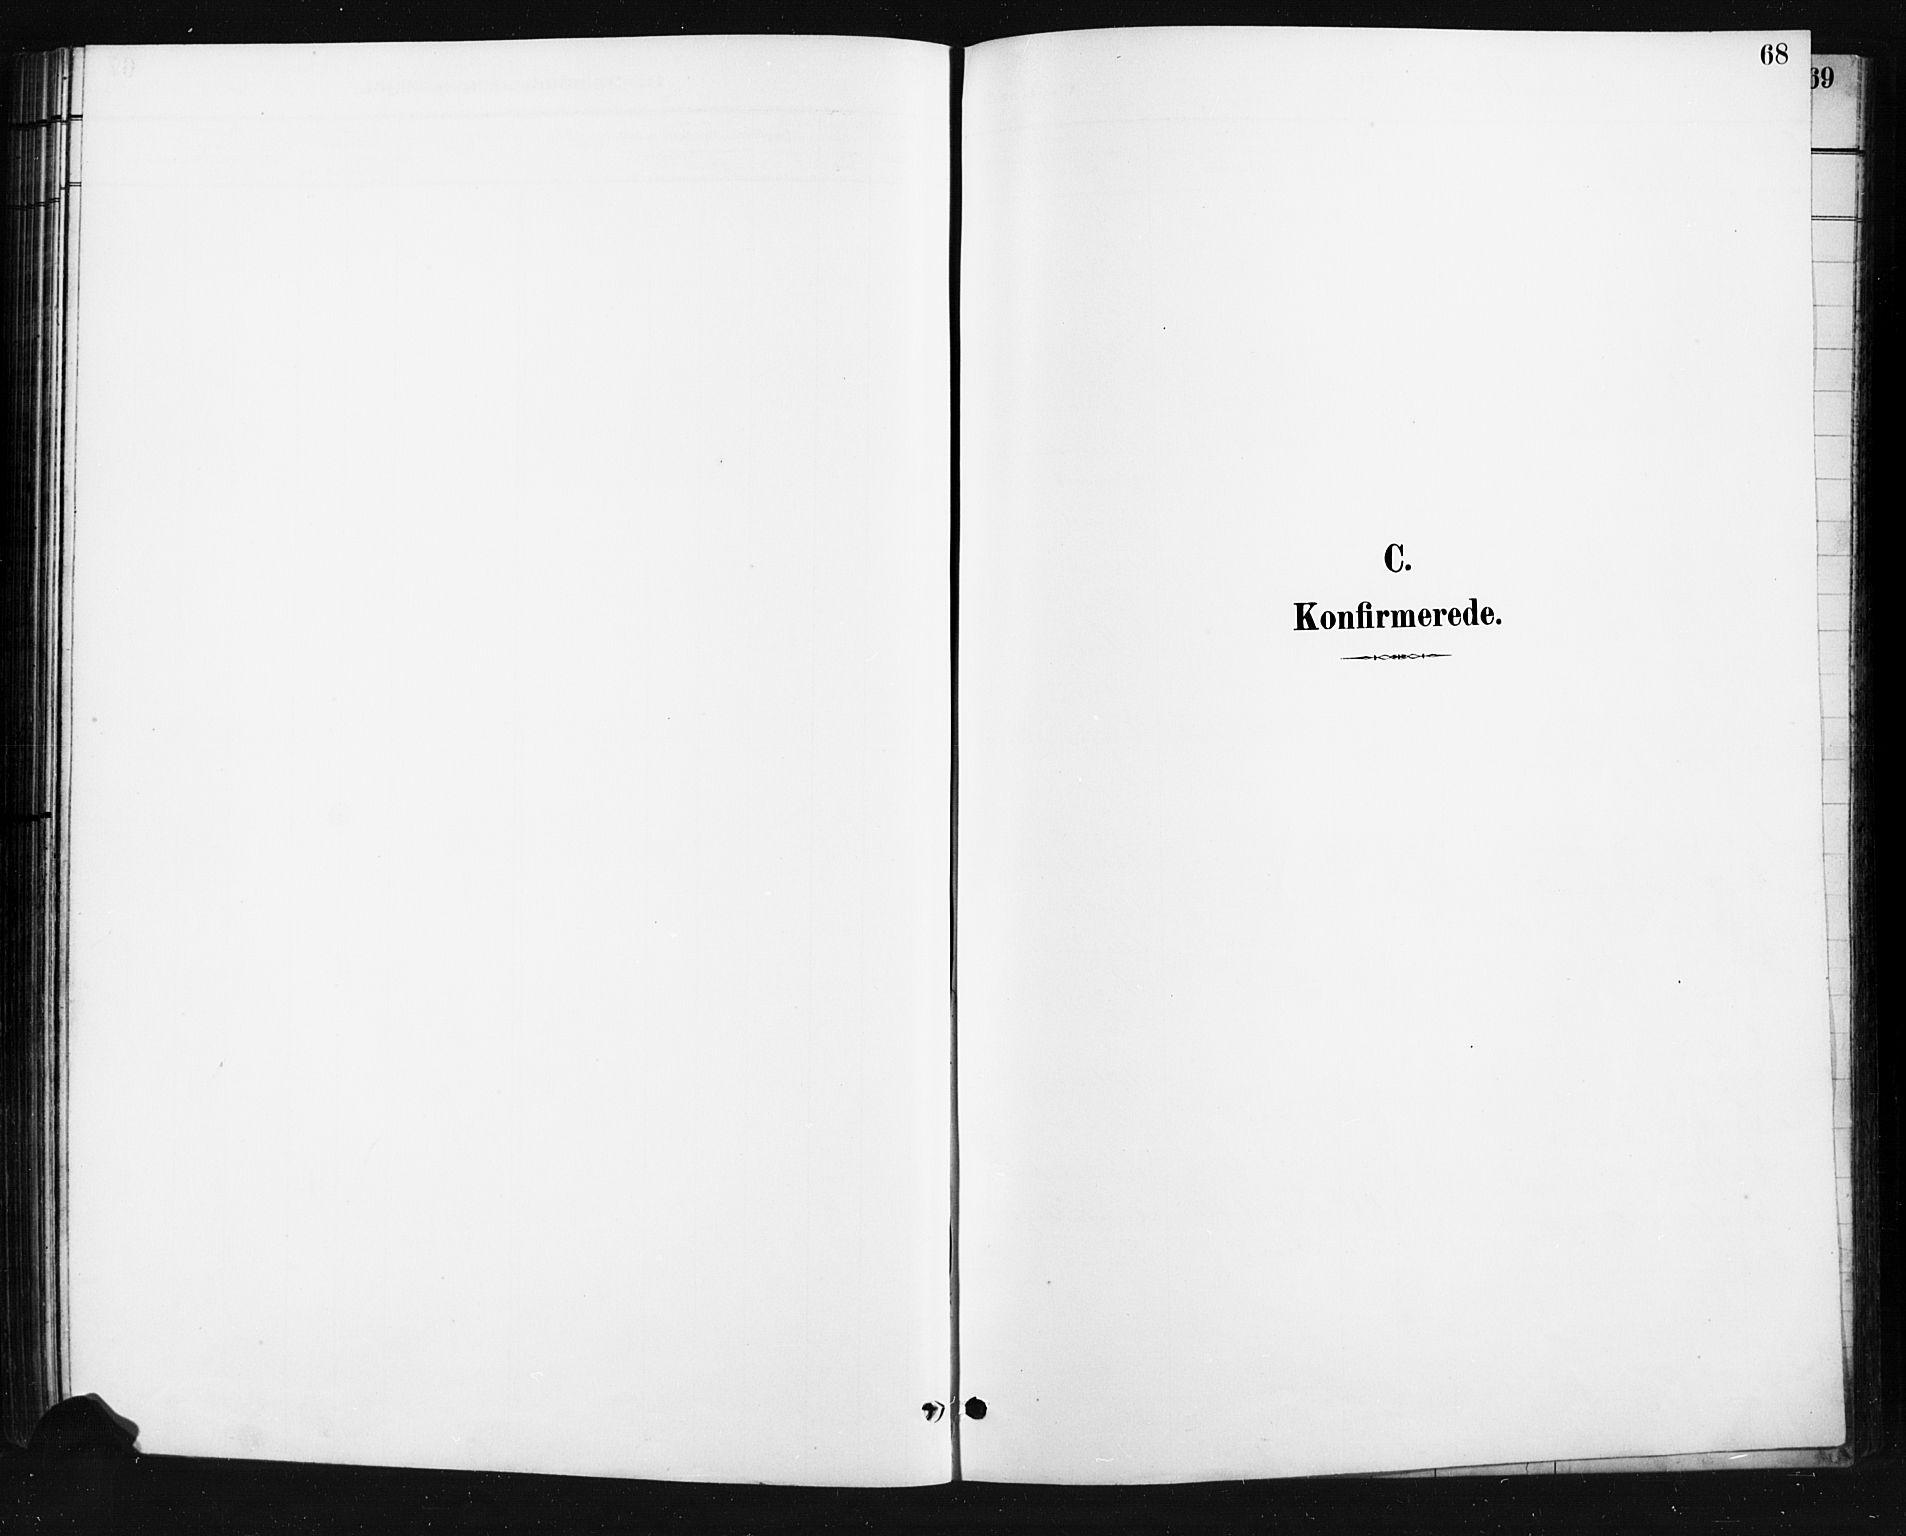 SAH, Skjåk prestekontor, Klokkerbok nr. 4, 1895-1921, s. 68